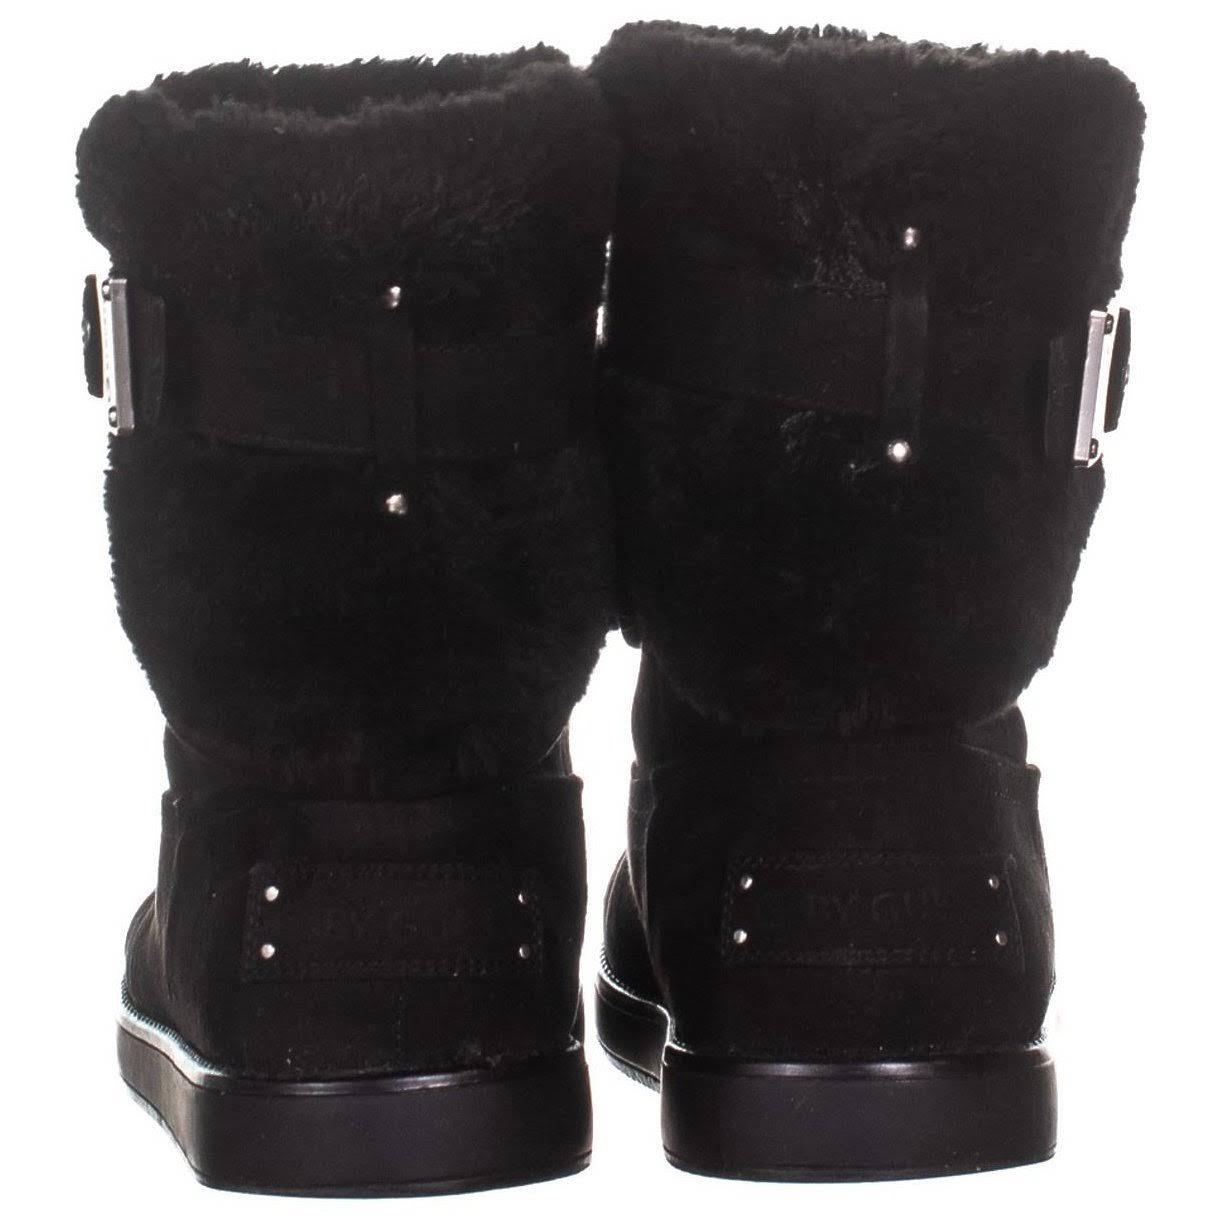 nero7 G Winter Aussie Guess 568tessuto Boots 5 Us 4RL3Ajc5qS